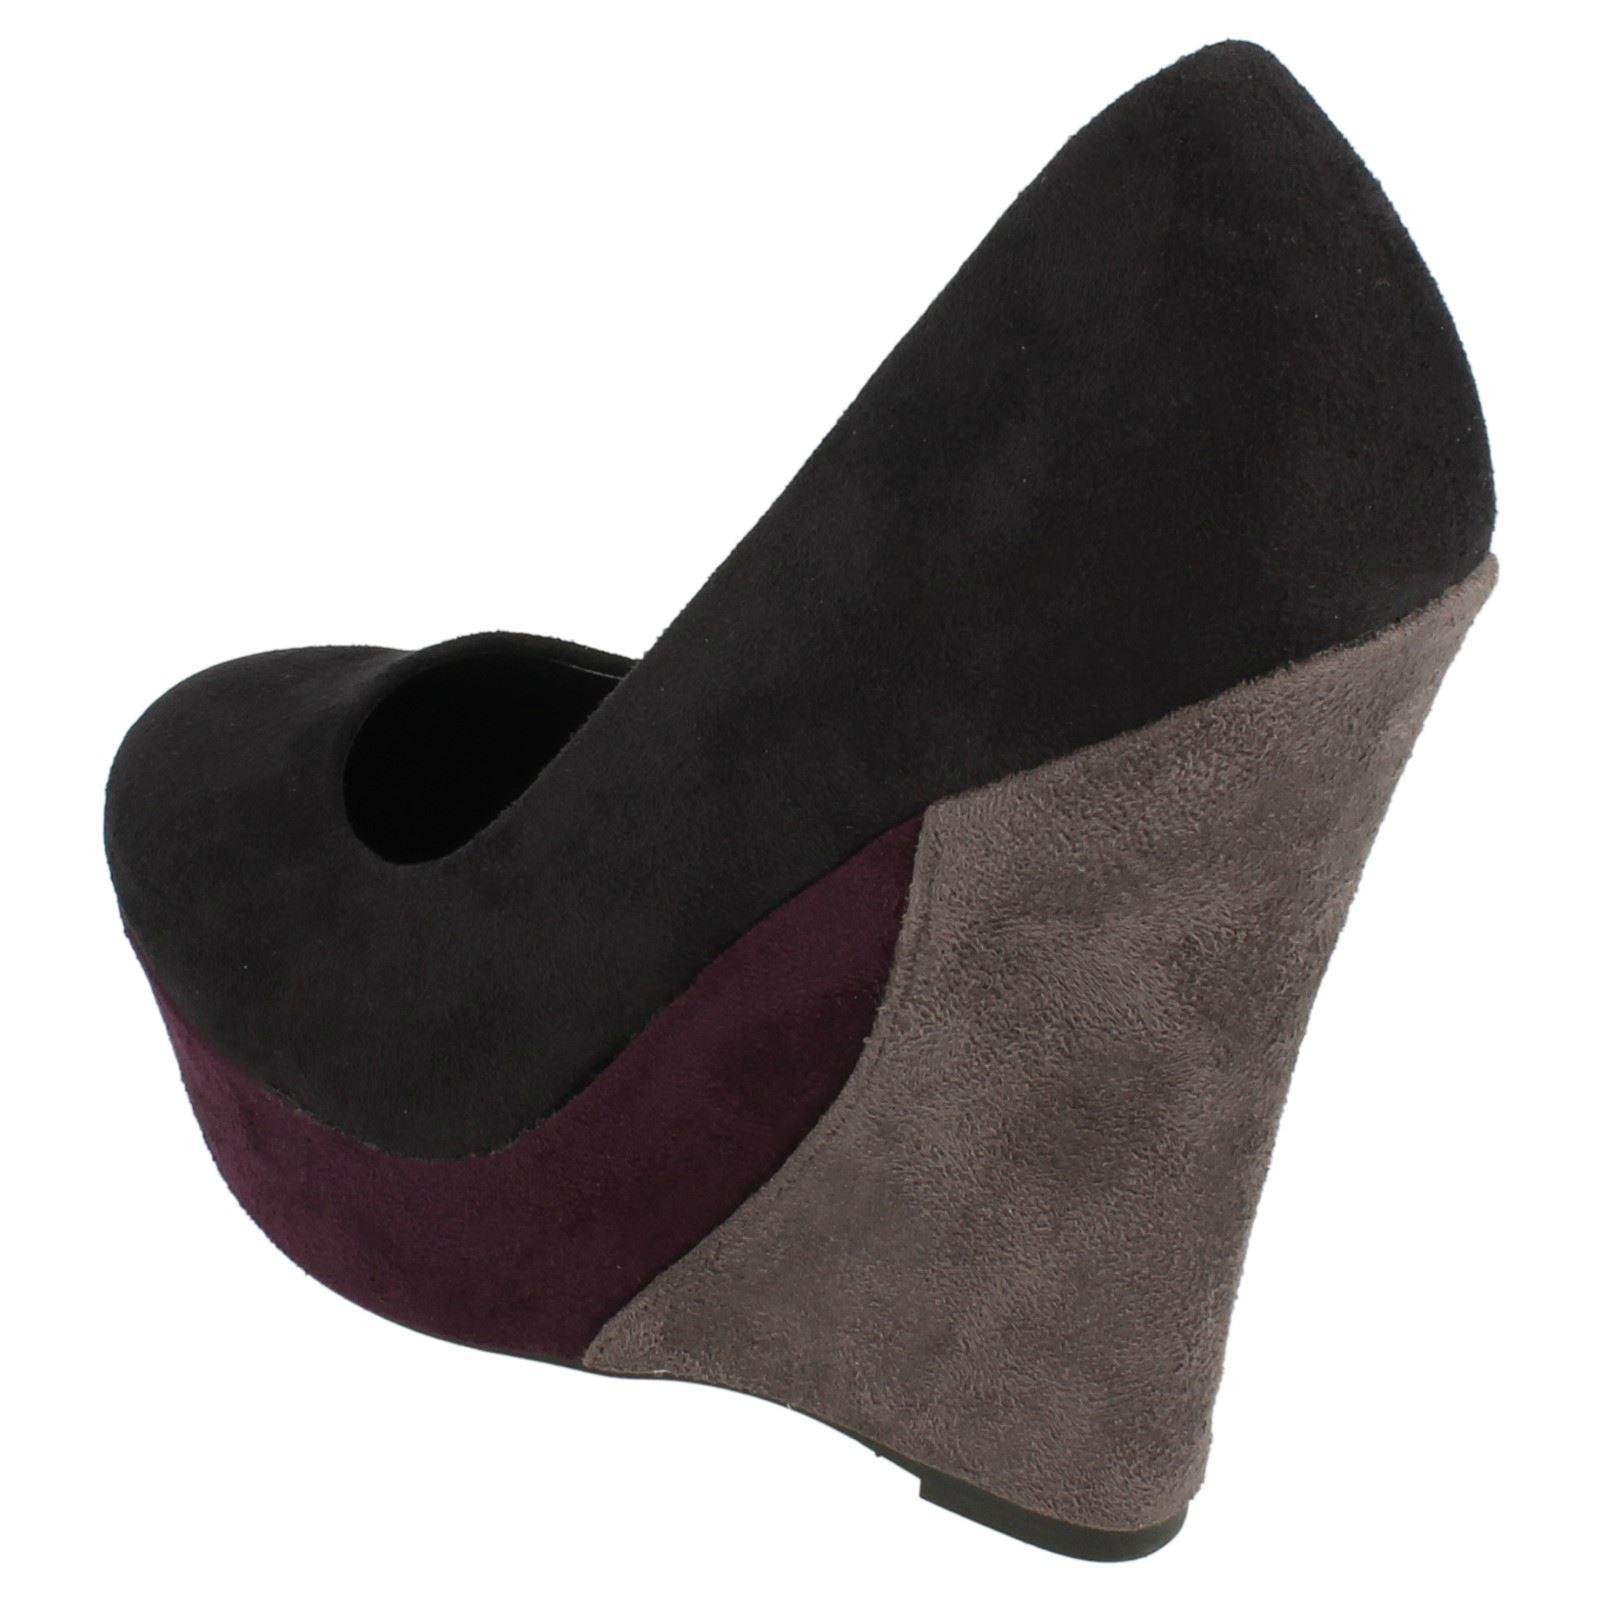 Ladies Spot On High Wedge Platform Court Shoe